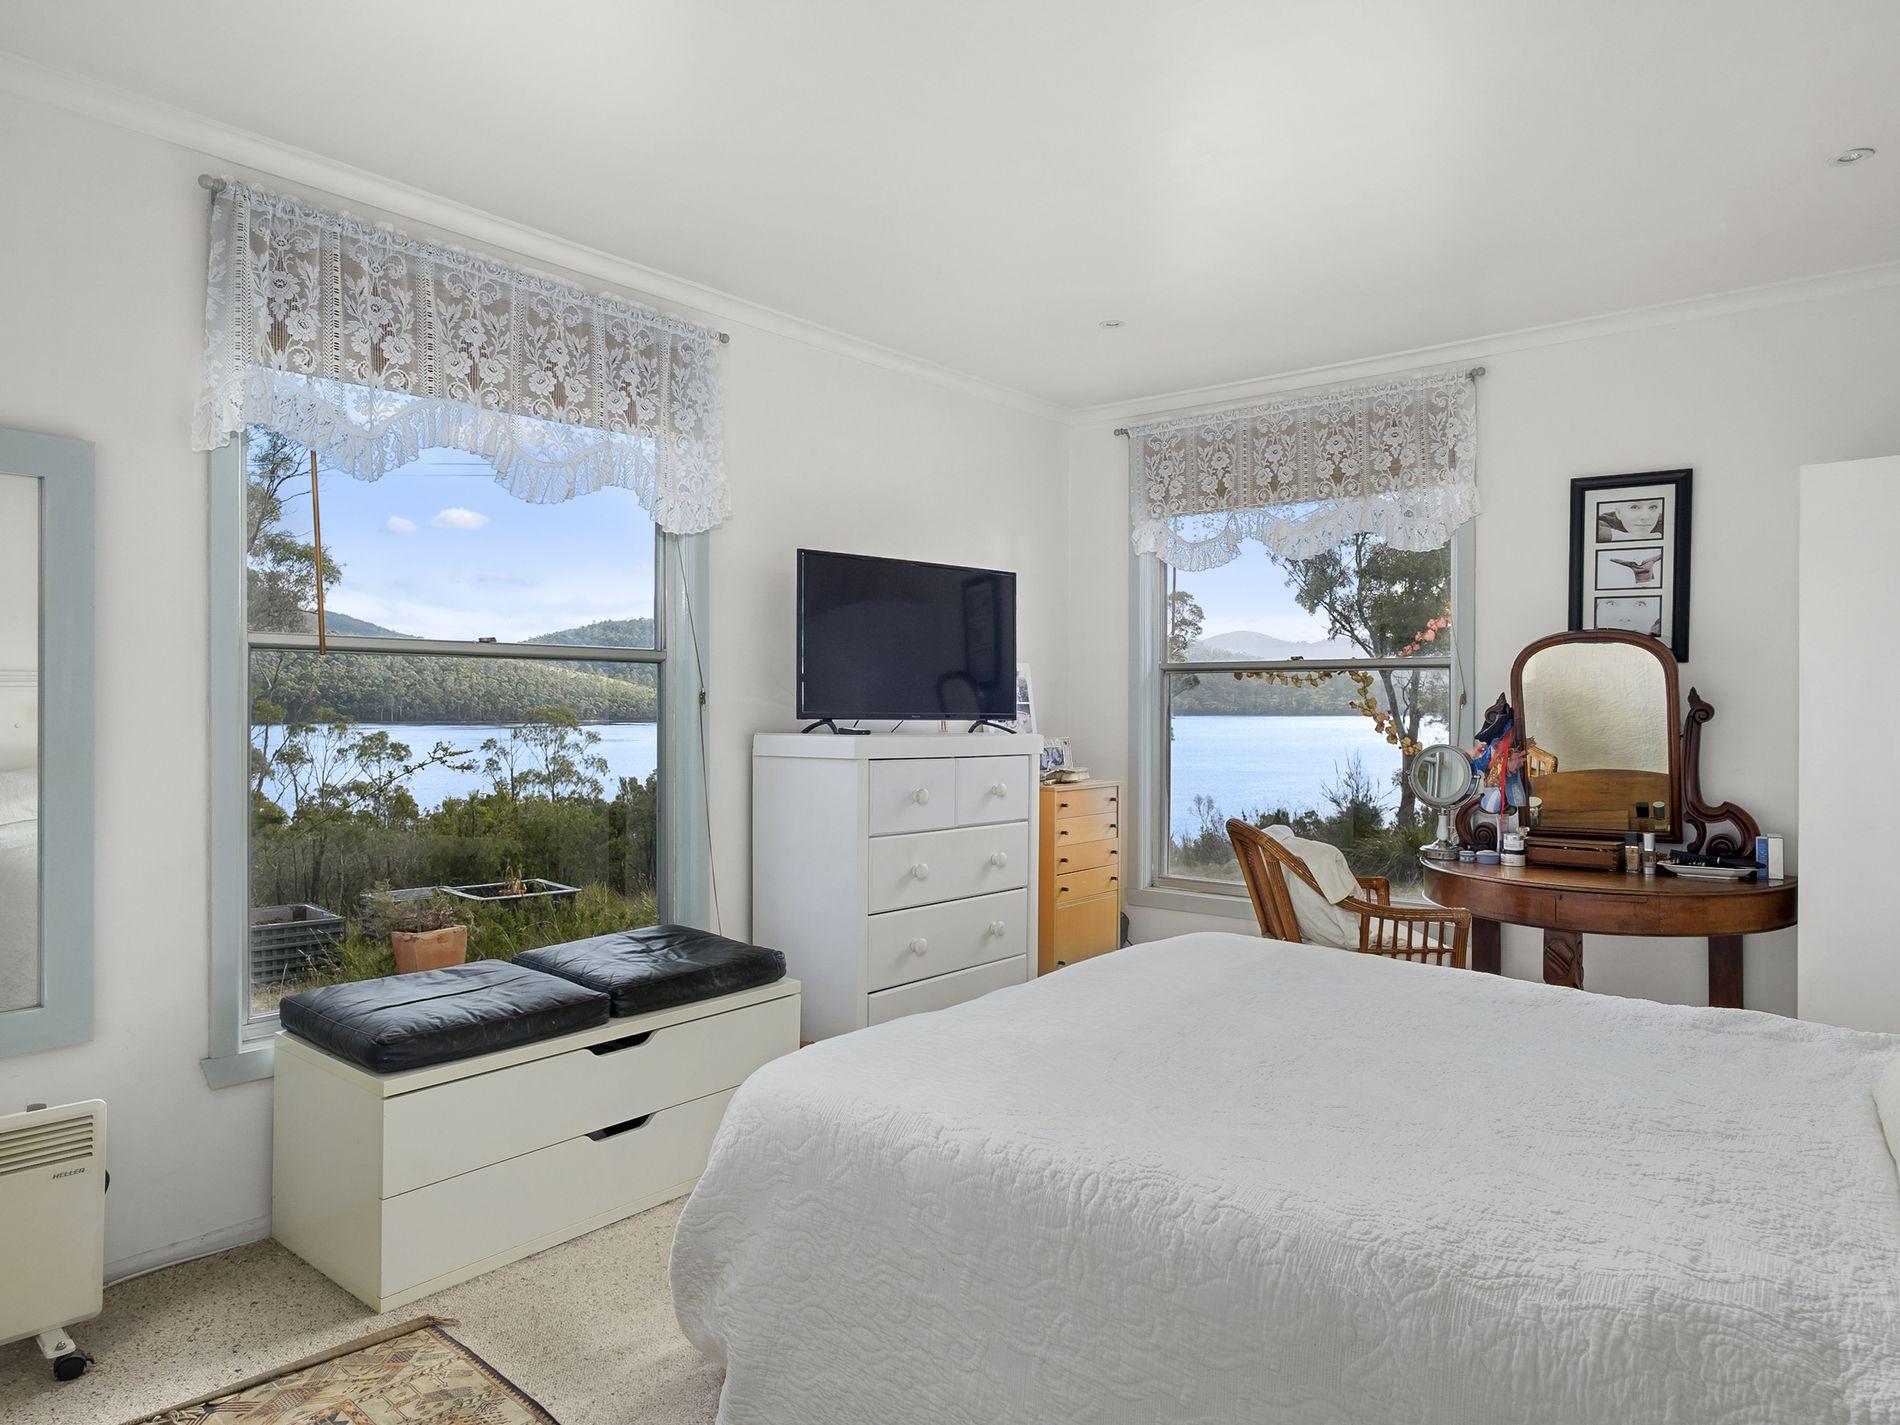 808 Cygnet Coast Road, Petcheys Bay